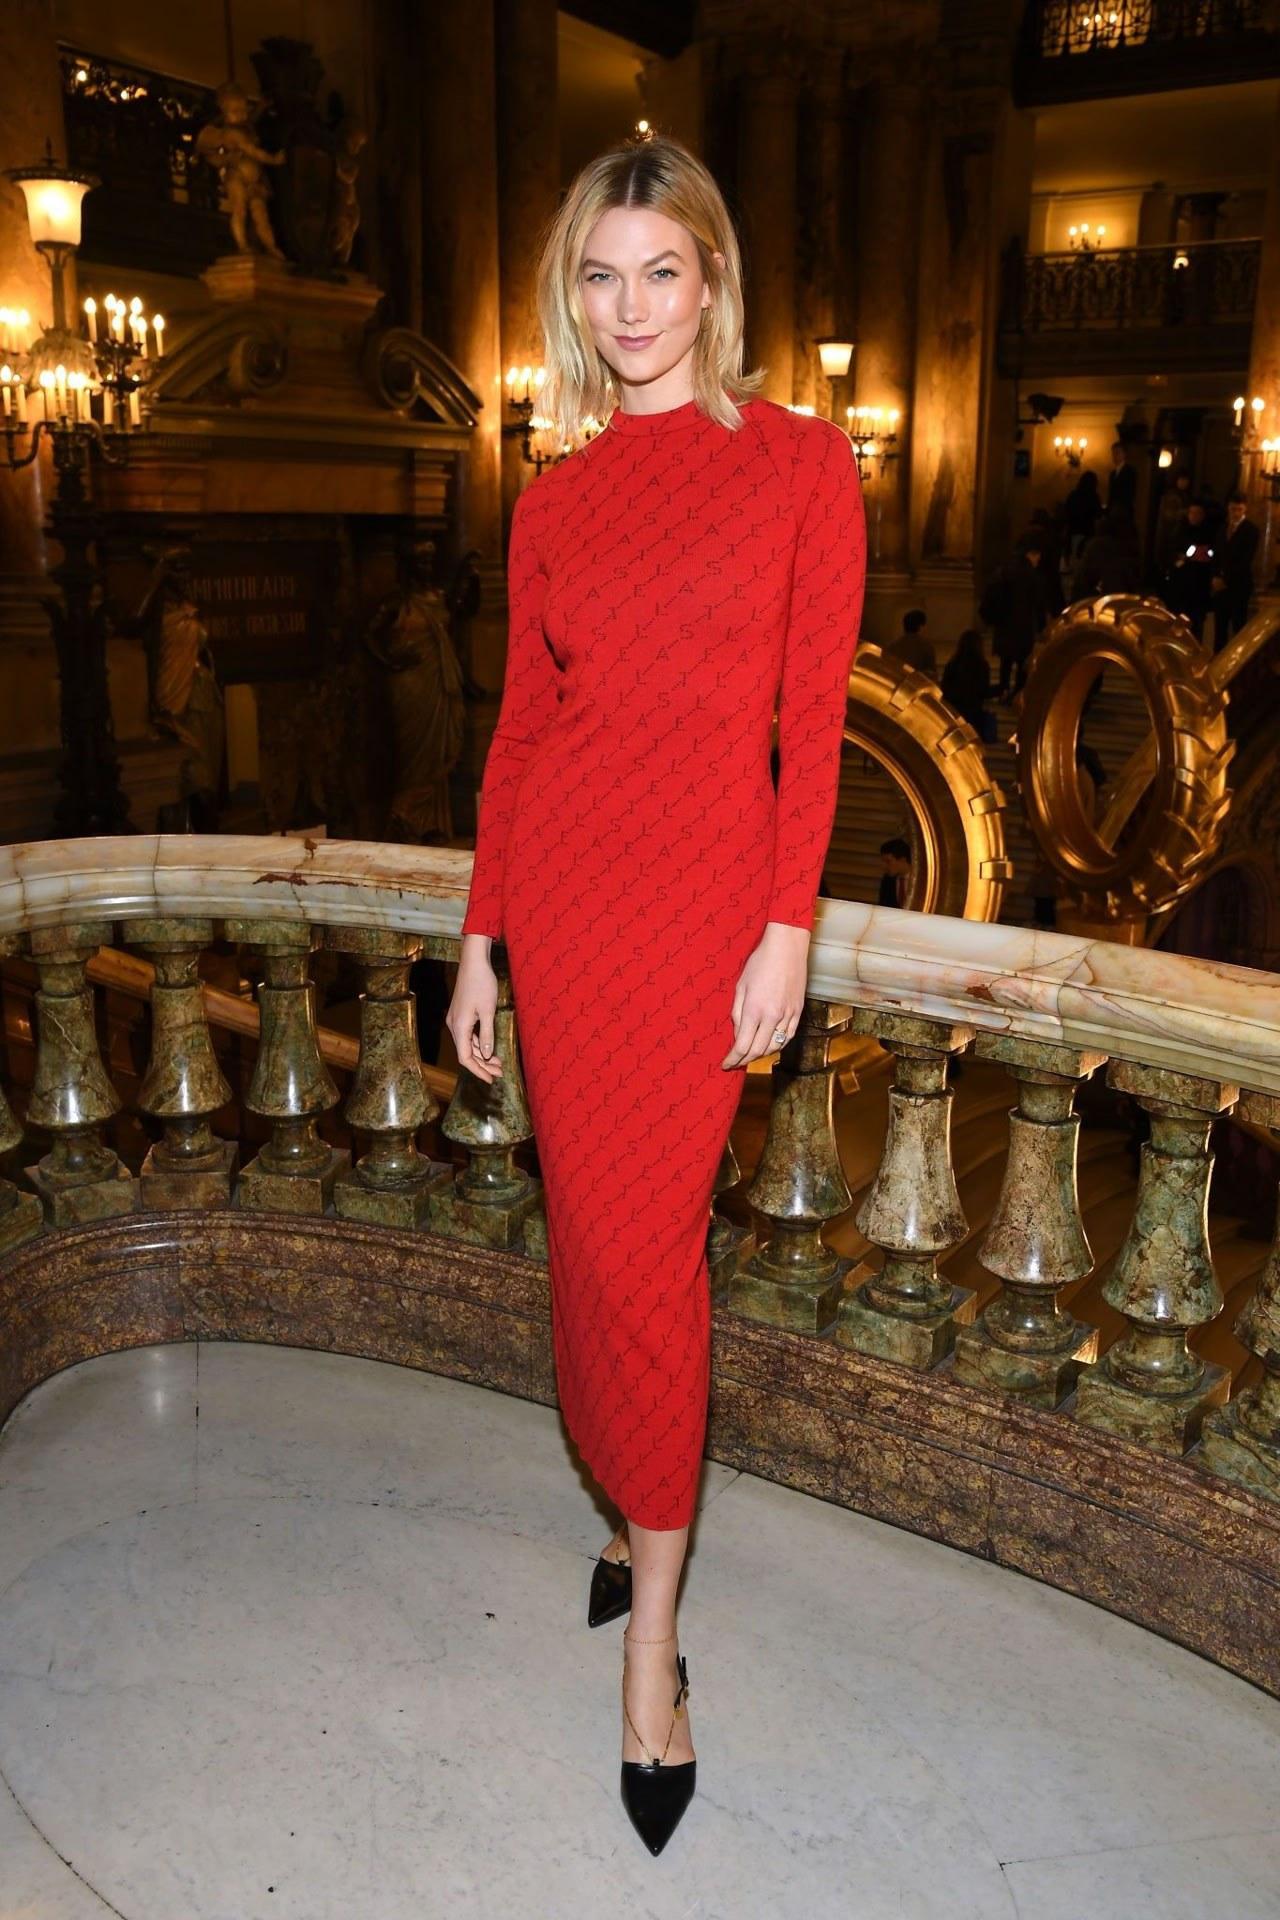 dress karlie kloss model off-duty midi dress red dress pumps red celebrity